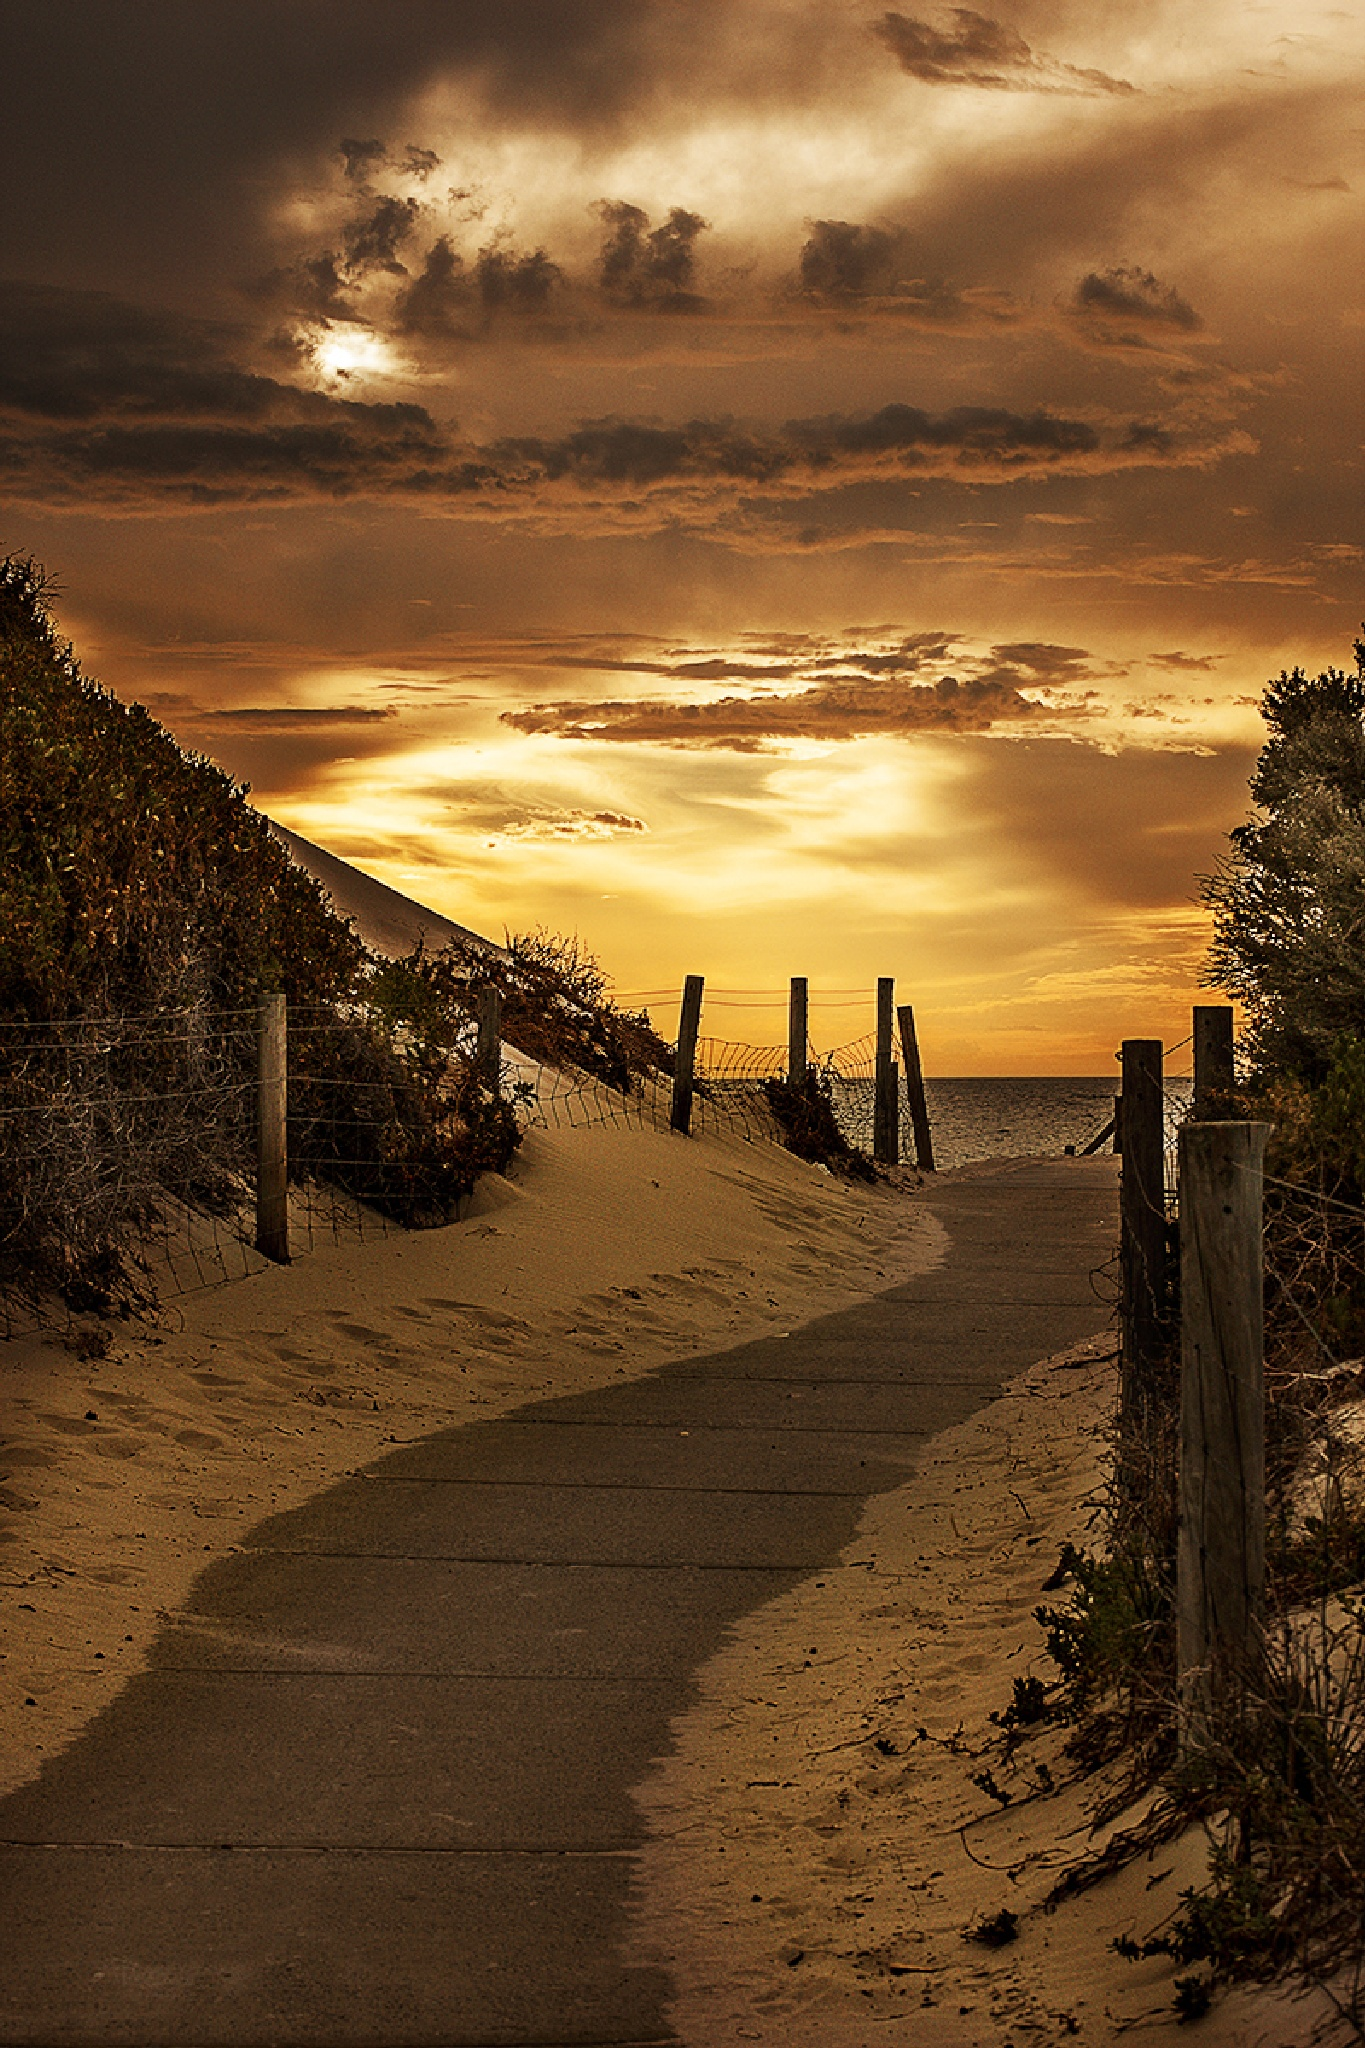 path to serenity 2 by Doc Jones